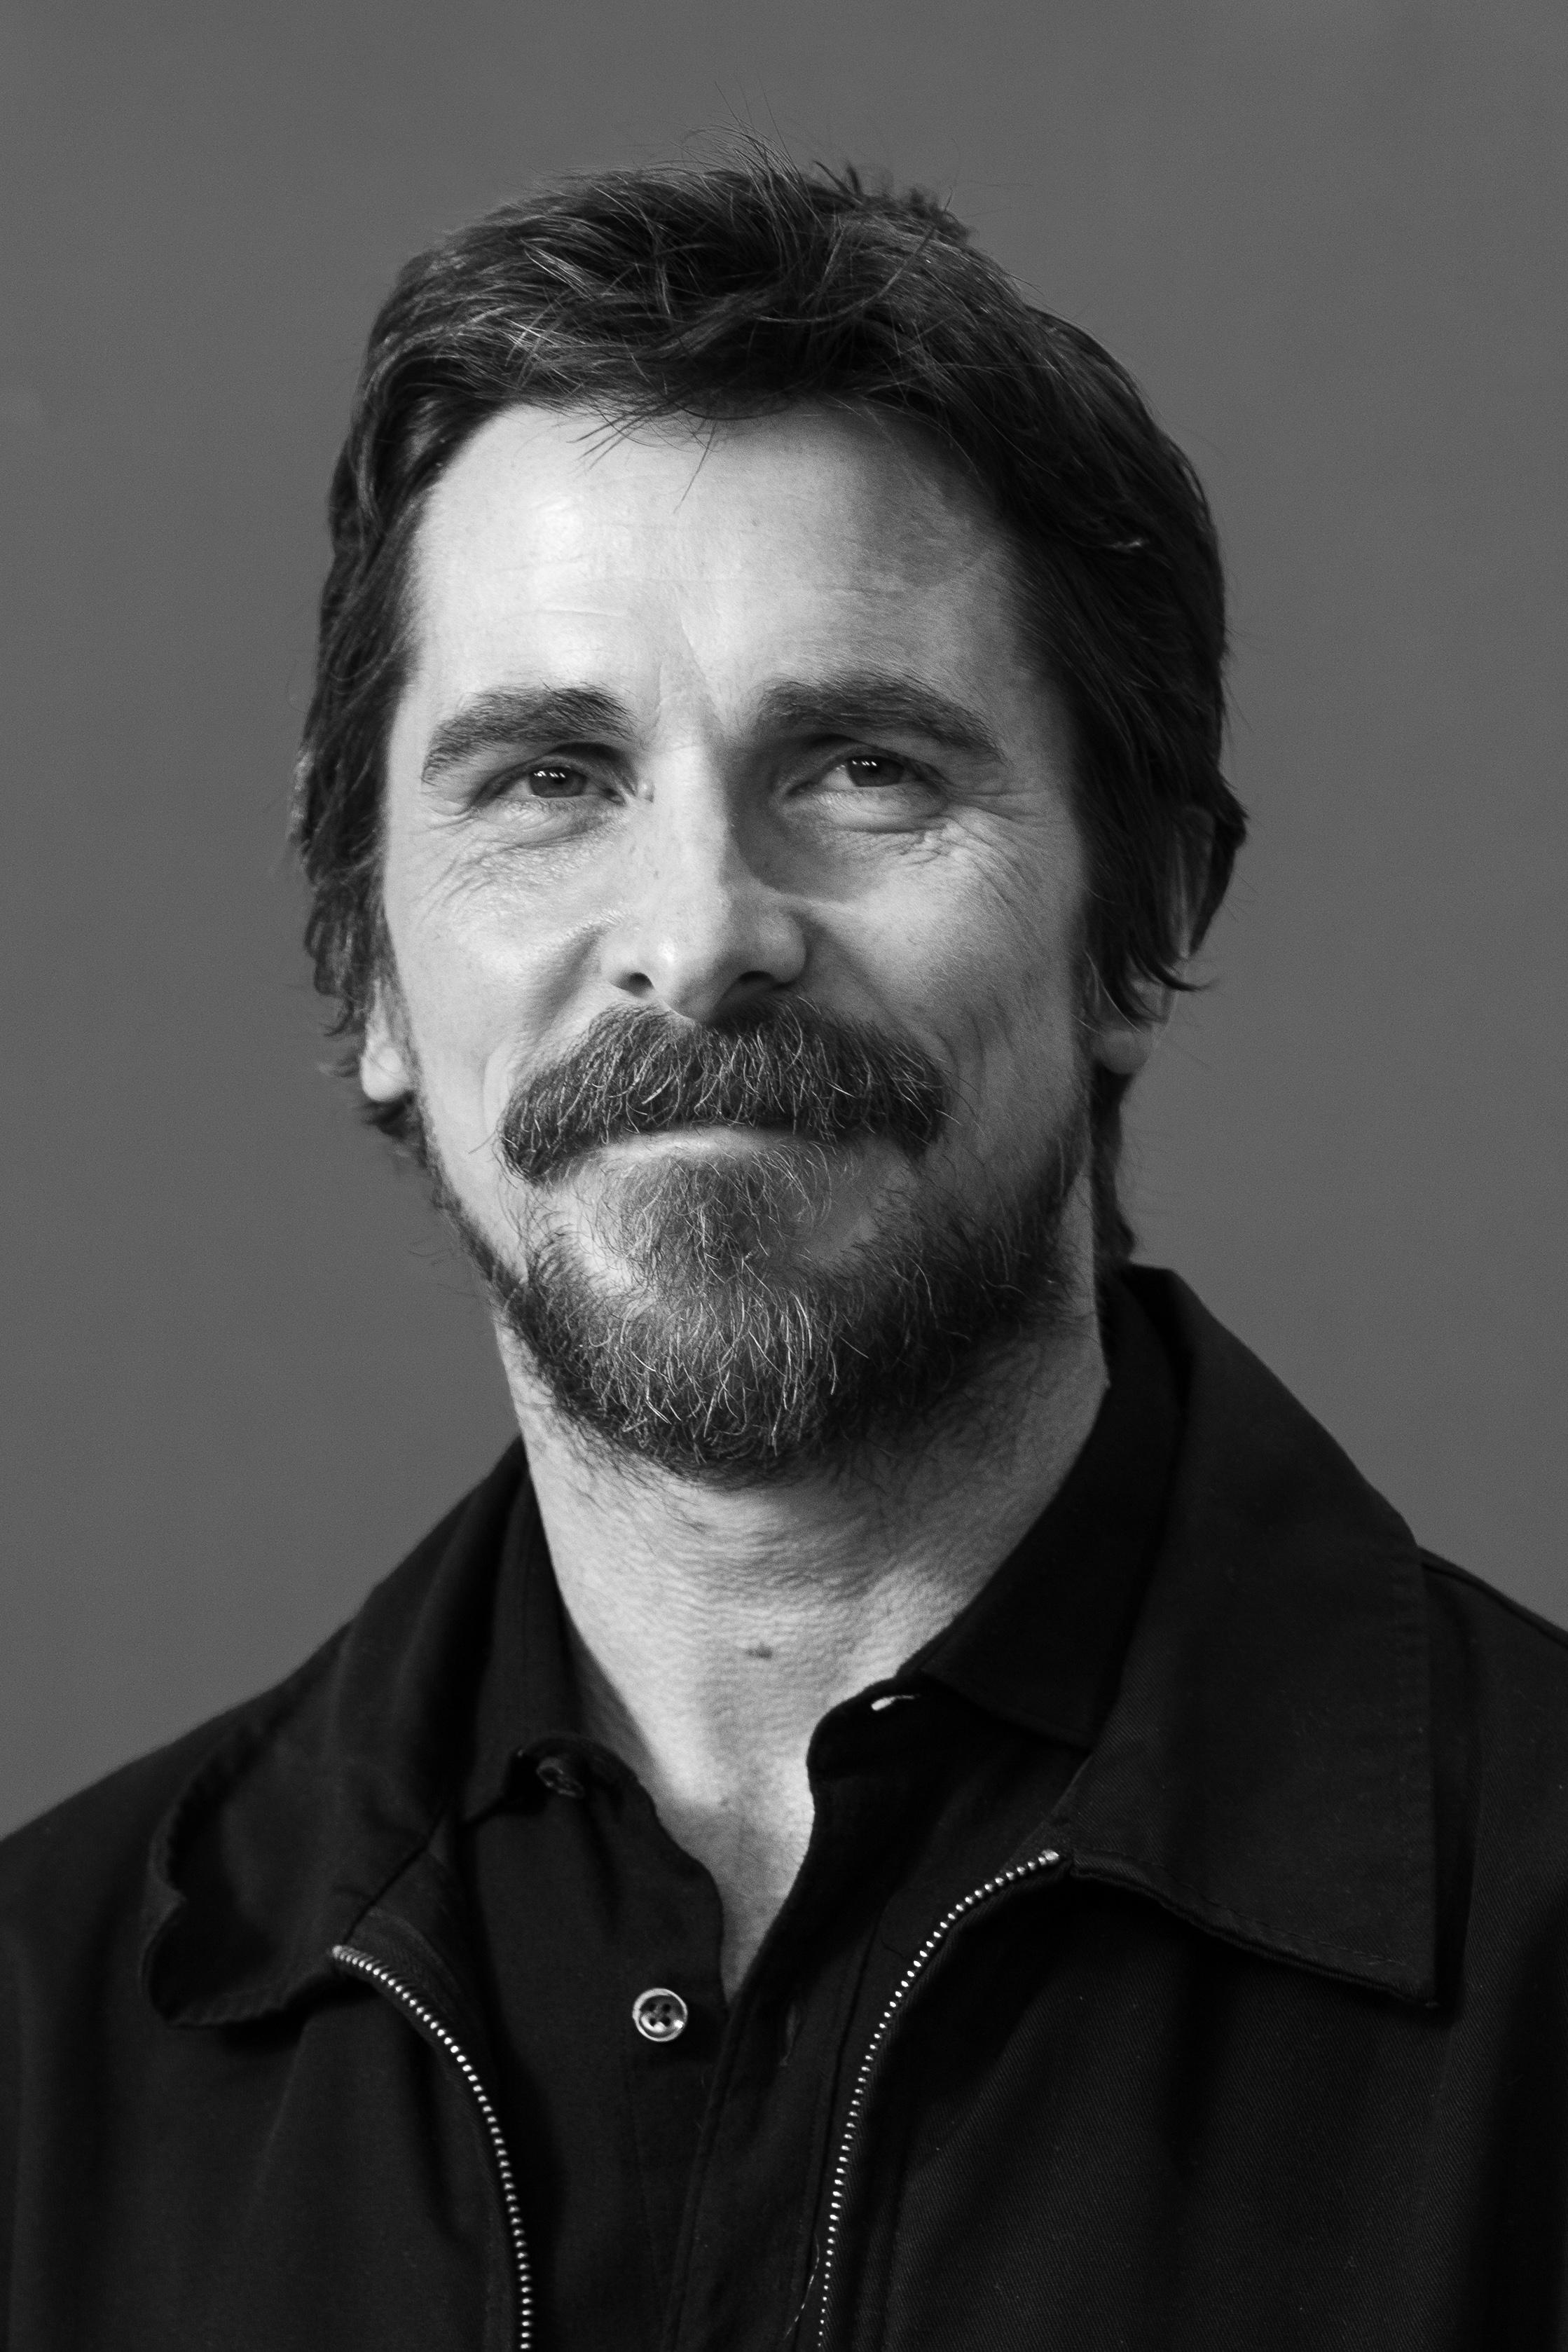 Christian Bale photo #111408, Christian Bale image